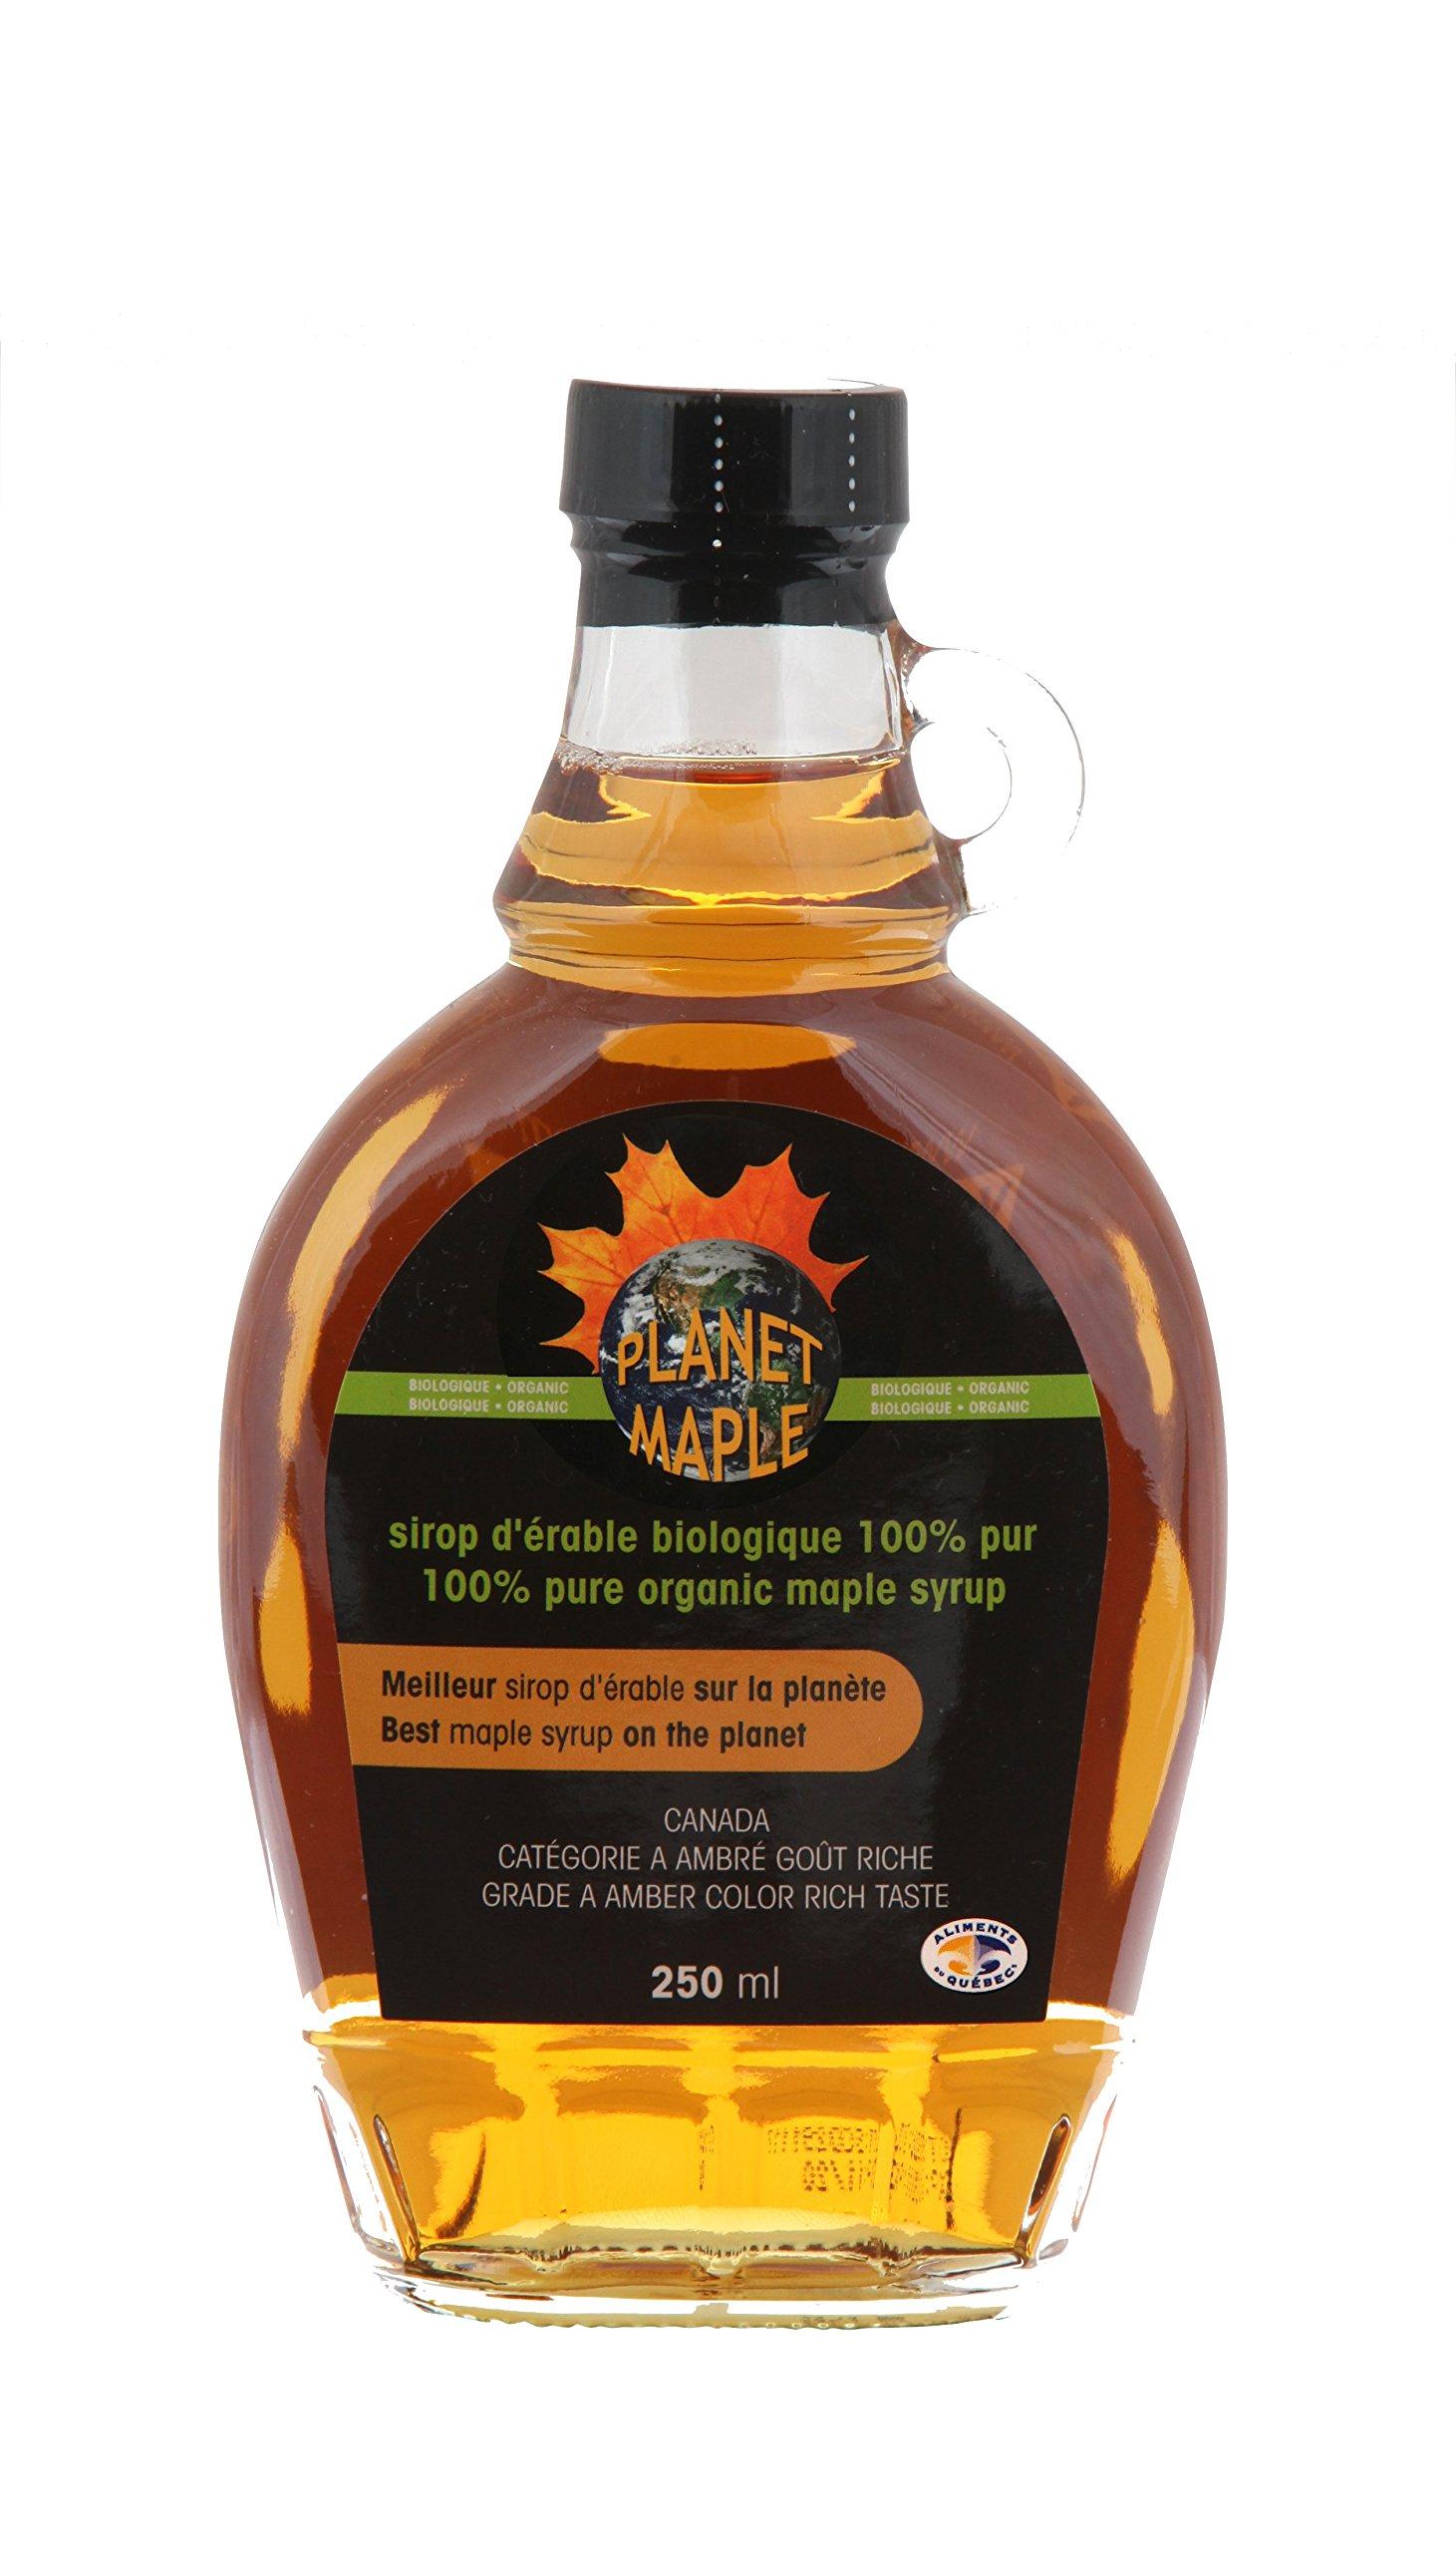 Planet Maple - Organic Maple Syrup - 250ml, Grade A, Amber Color, Vegan, Gluten Free, No Preservatives, 8.4fl. oz